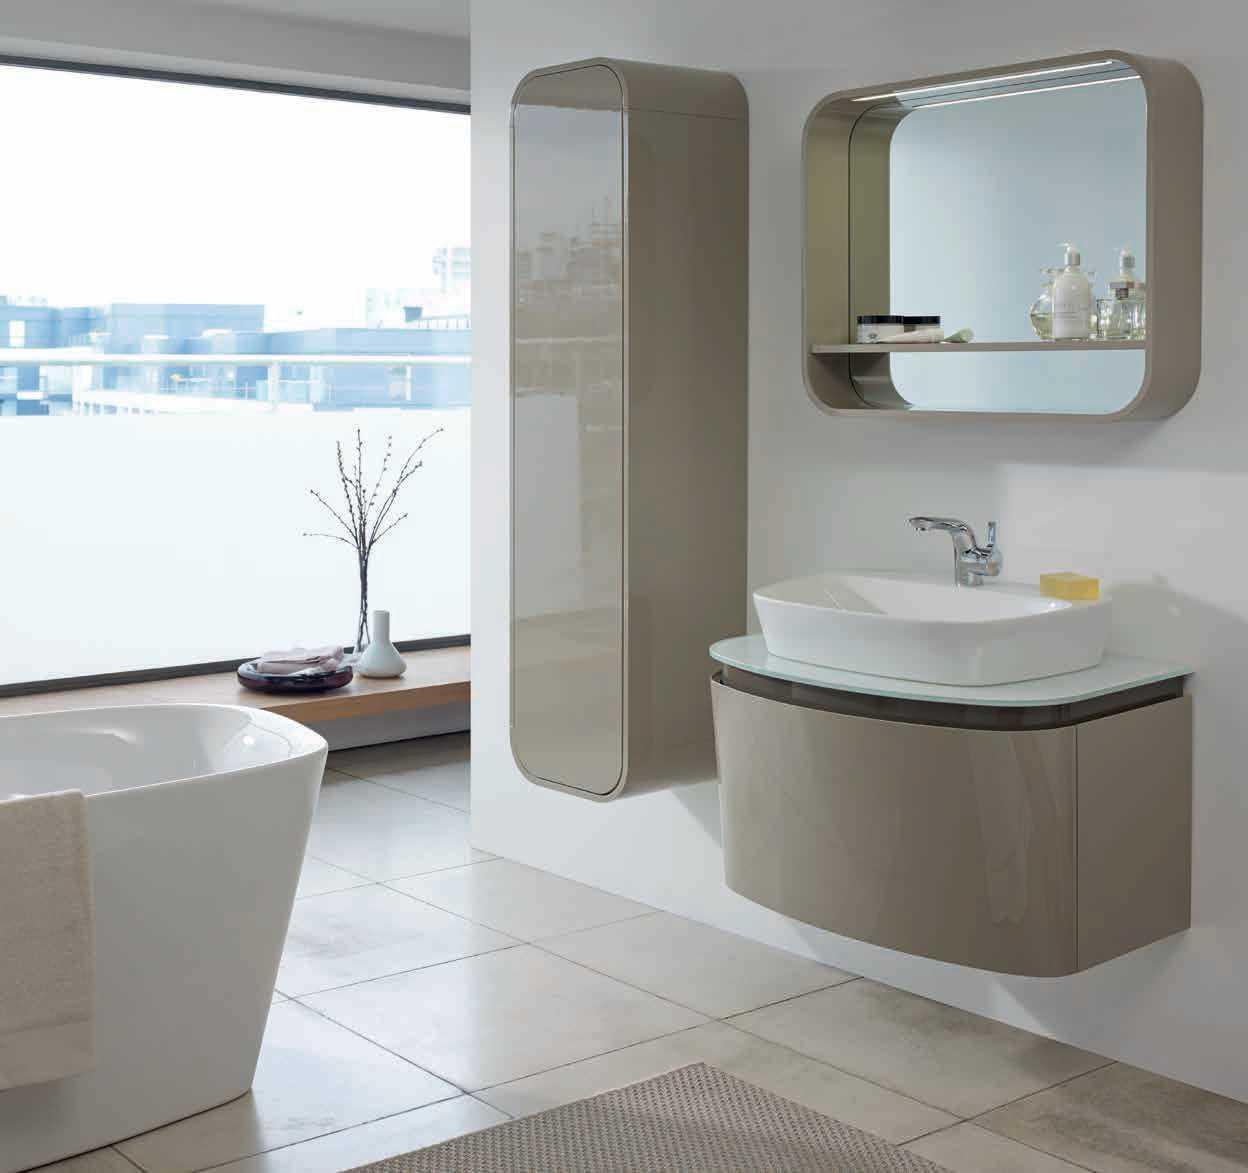 Ideal Standard Mobili Da Bagno.Sanitari Arredo Bagno Alto Adige Dea Ceramica Sanitaria Di Ideal